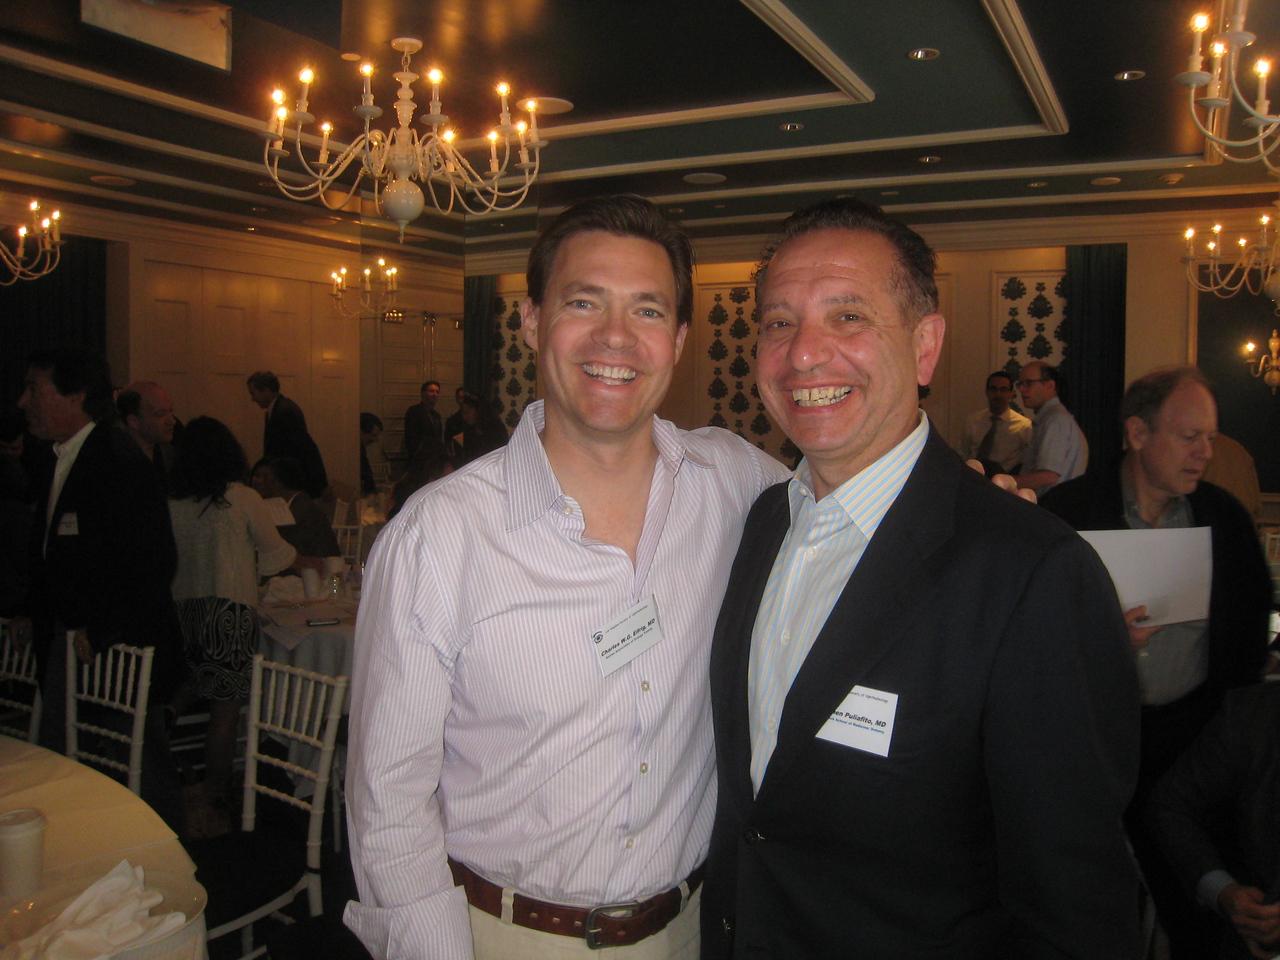 Charles Eifrig & the Dean of the USC Medical School, Carmen Puliafito